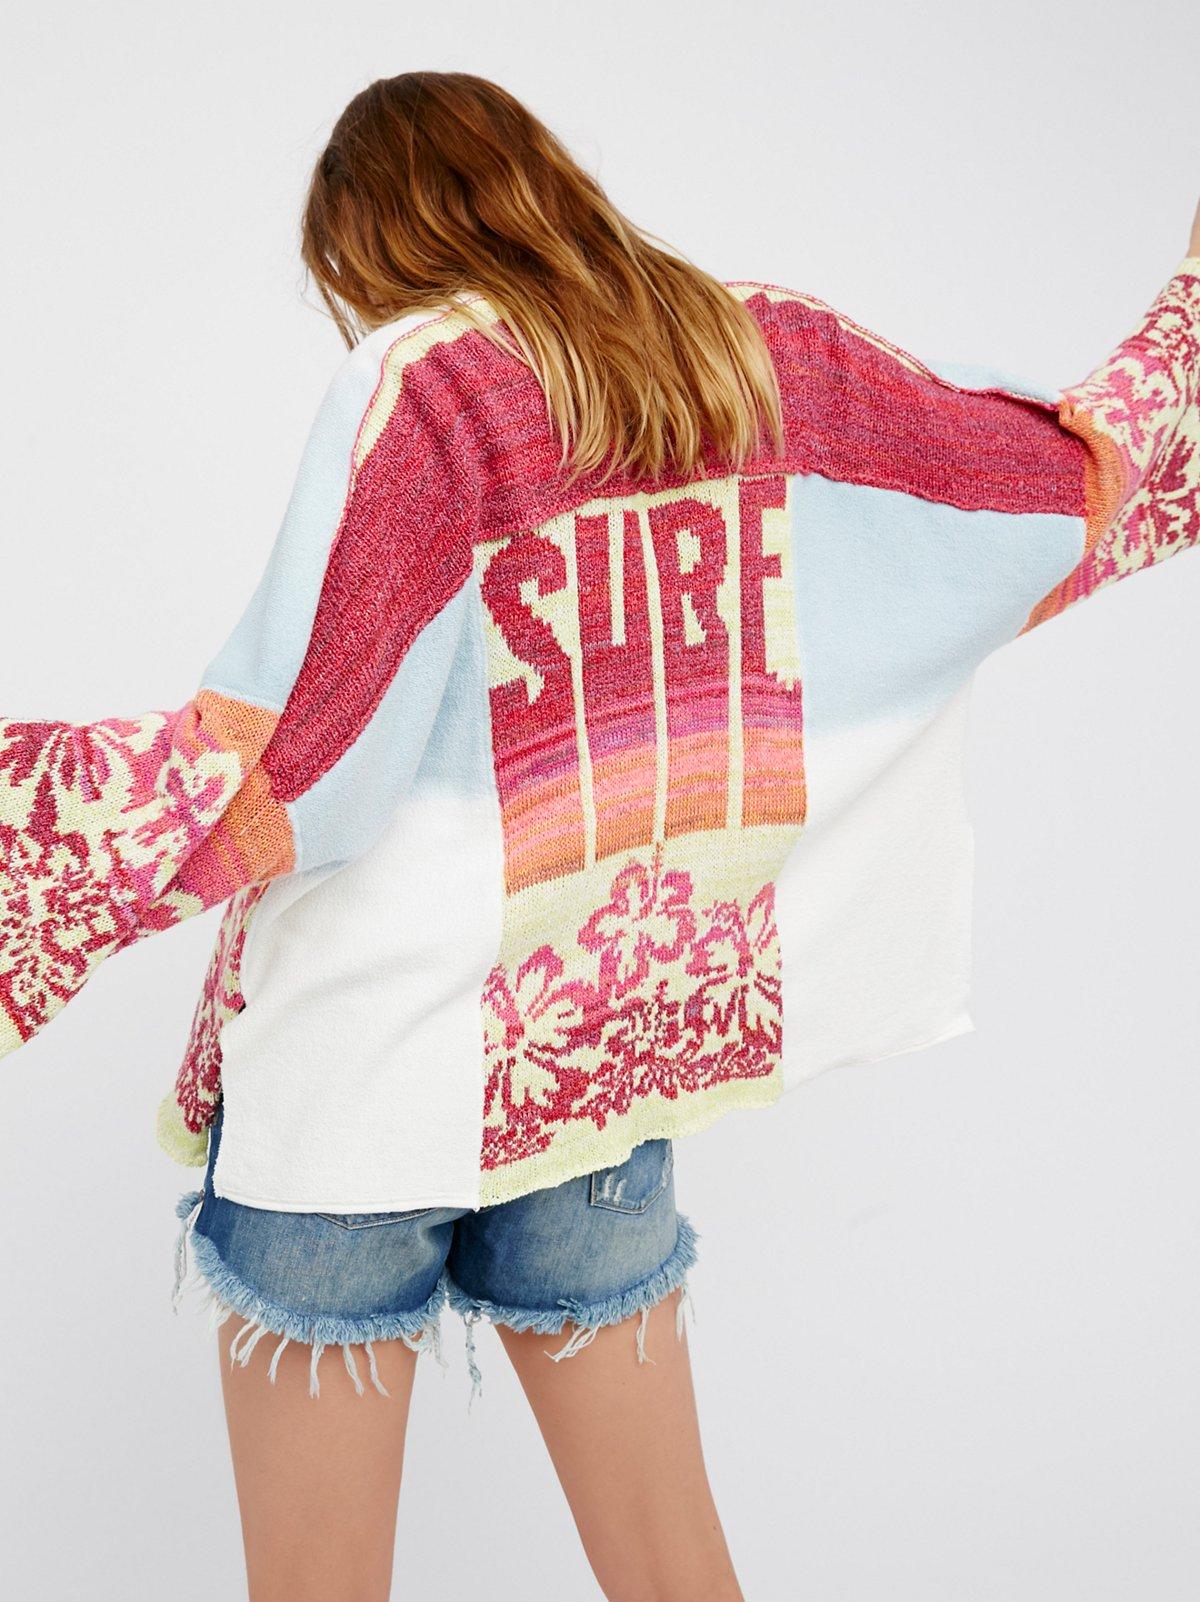 Surf毛线和服式上衣